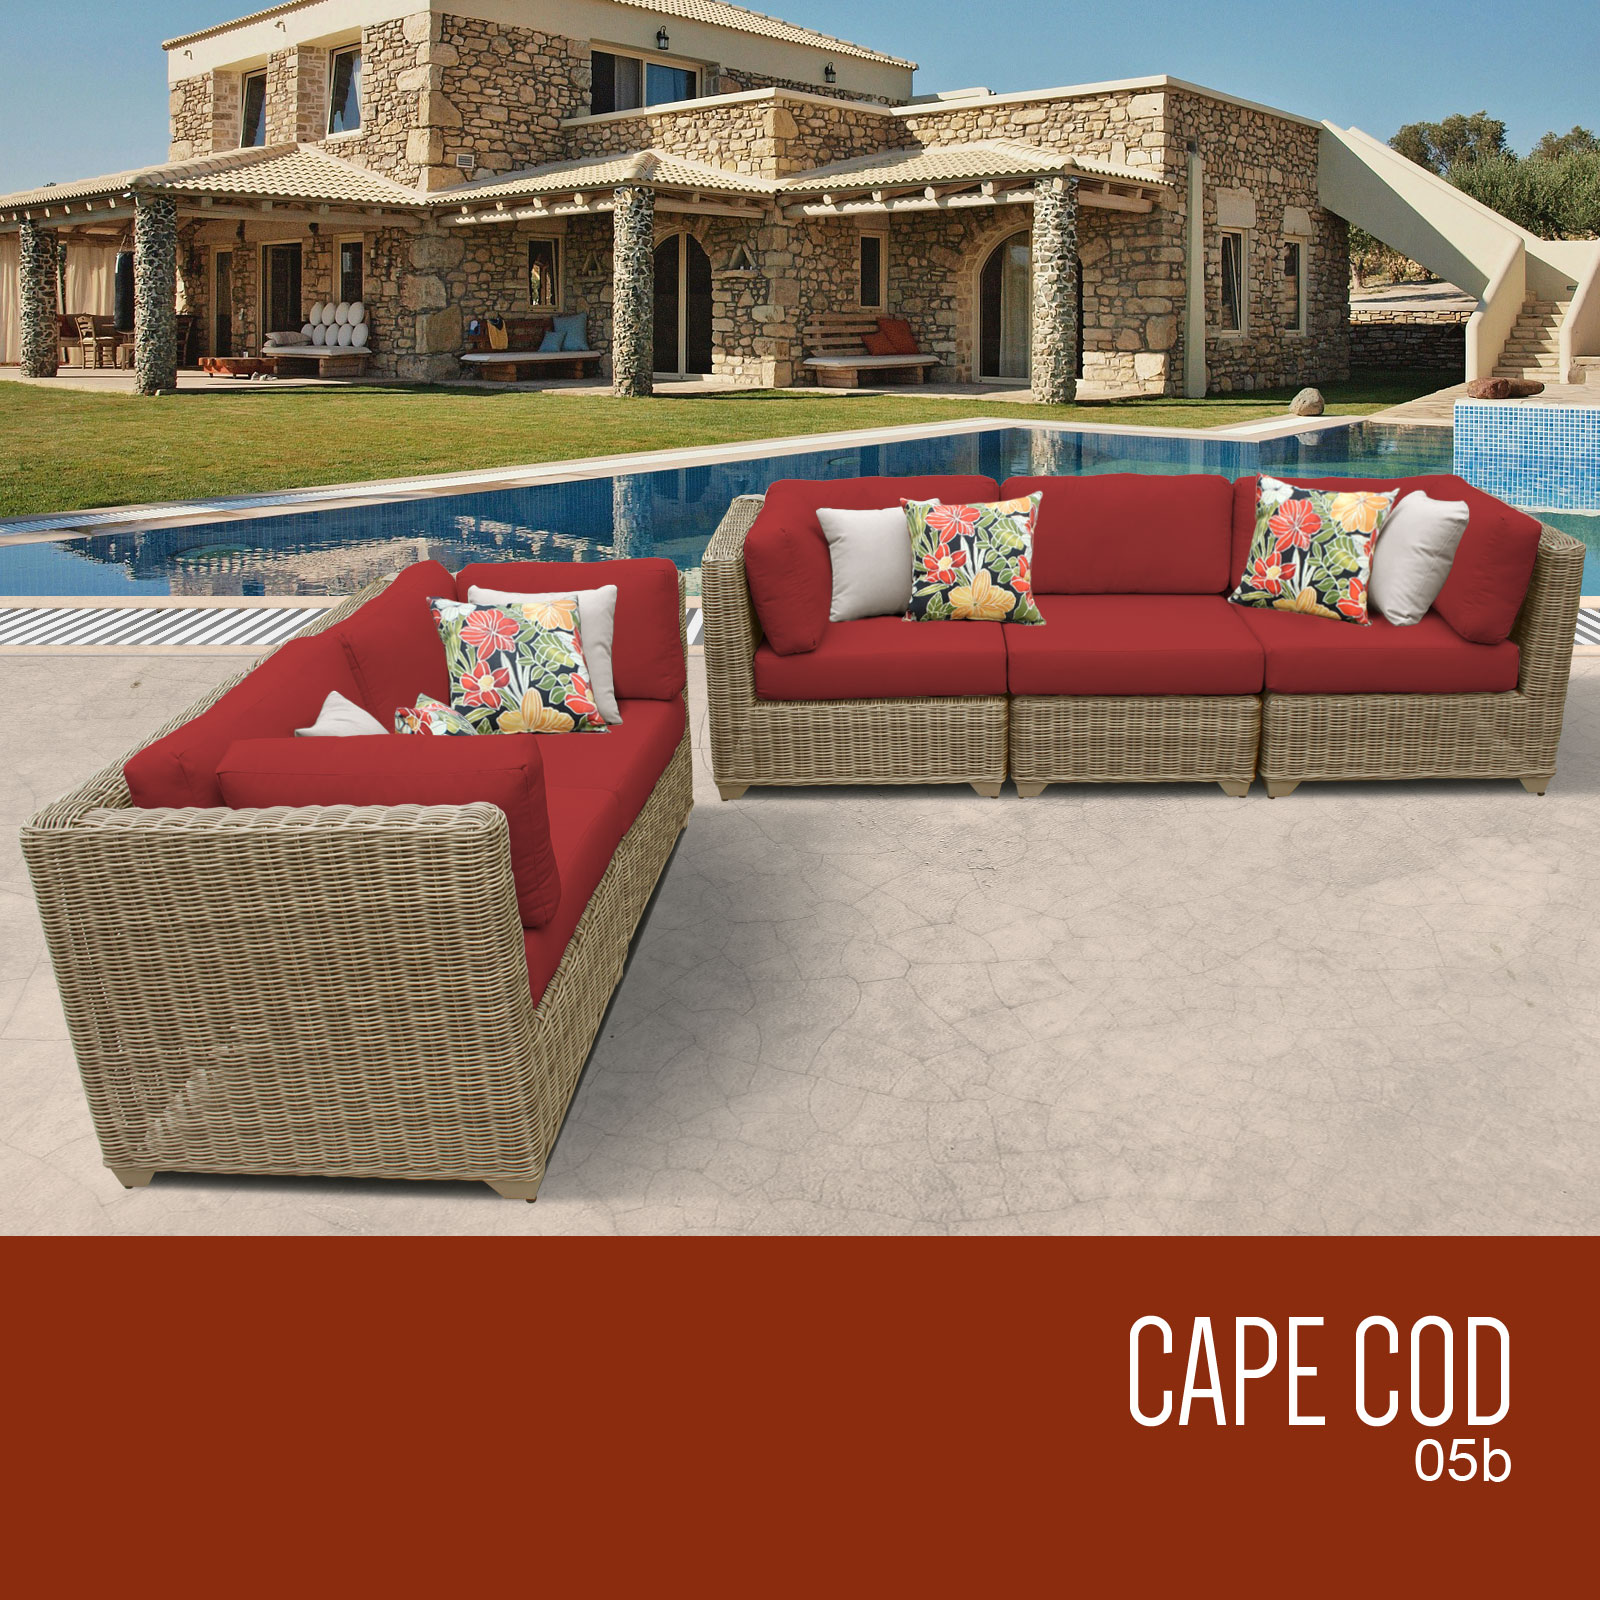 Cape Cod 5 Piece Outdoor Wicker Patio Furniture Set 05b Color Terracotta Walmart Com Walmart Com